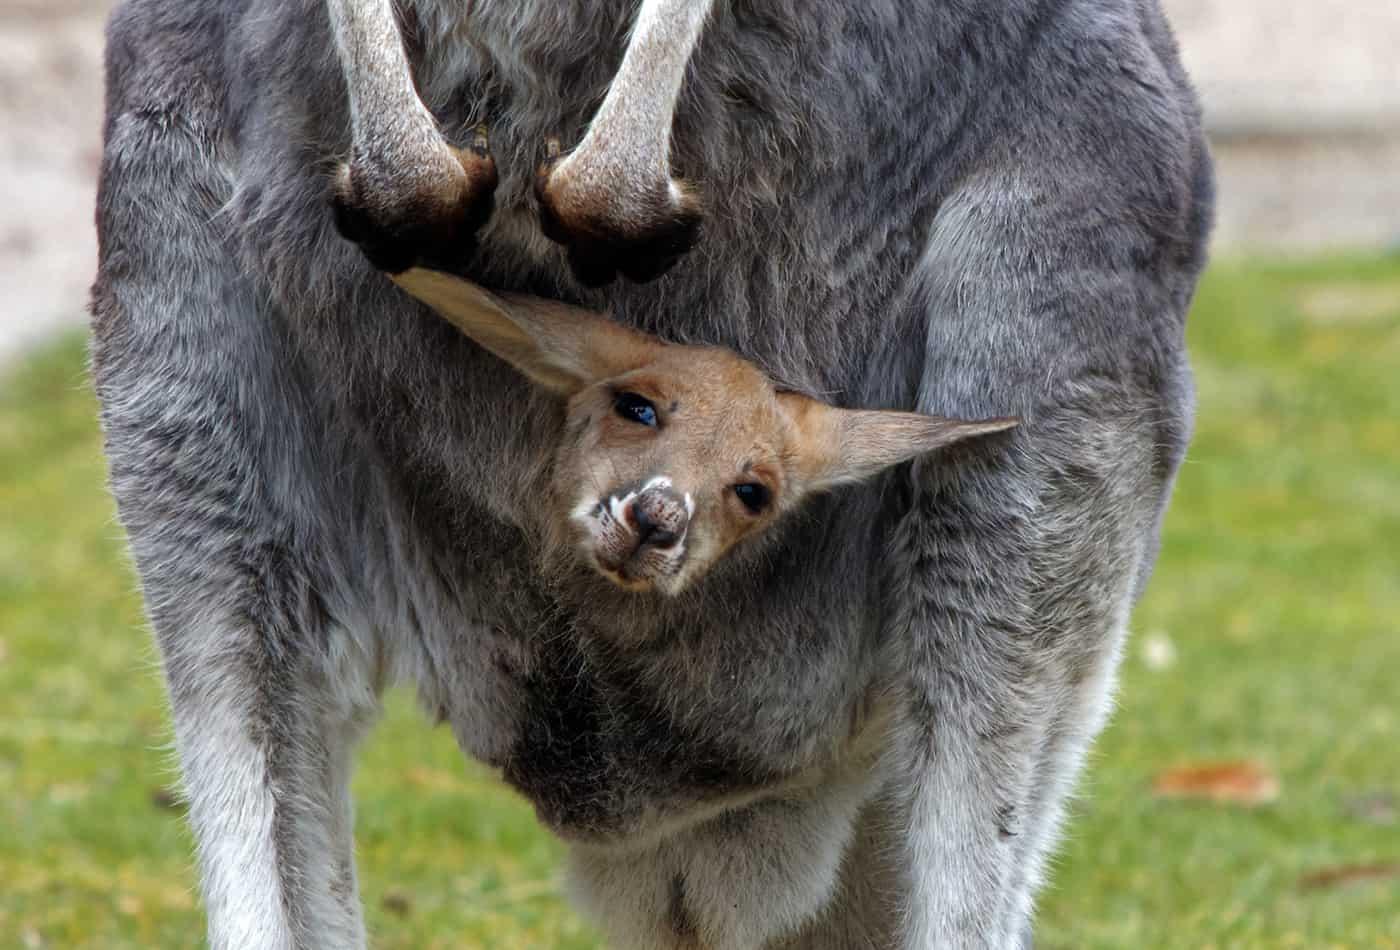 Junges Känguru guckt aus dem Beutel (Foto: K.W./Zoo Heidelberg)